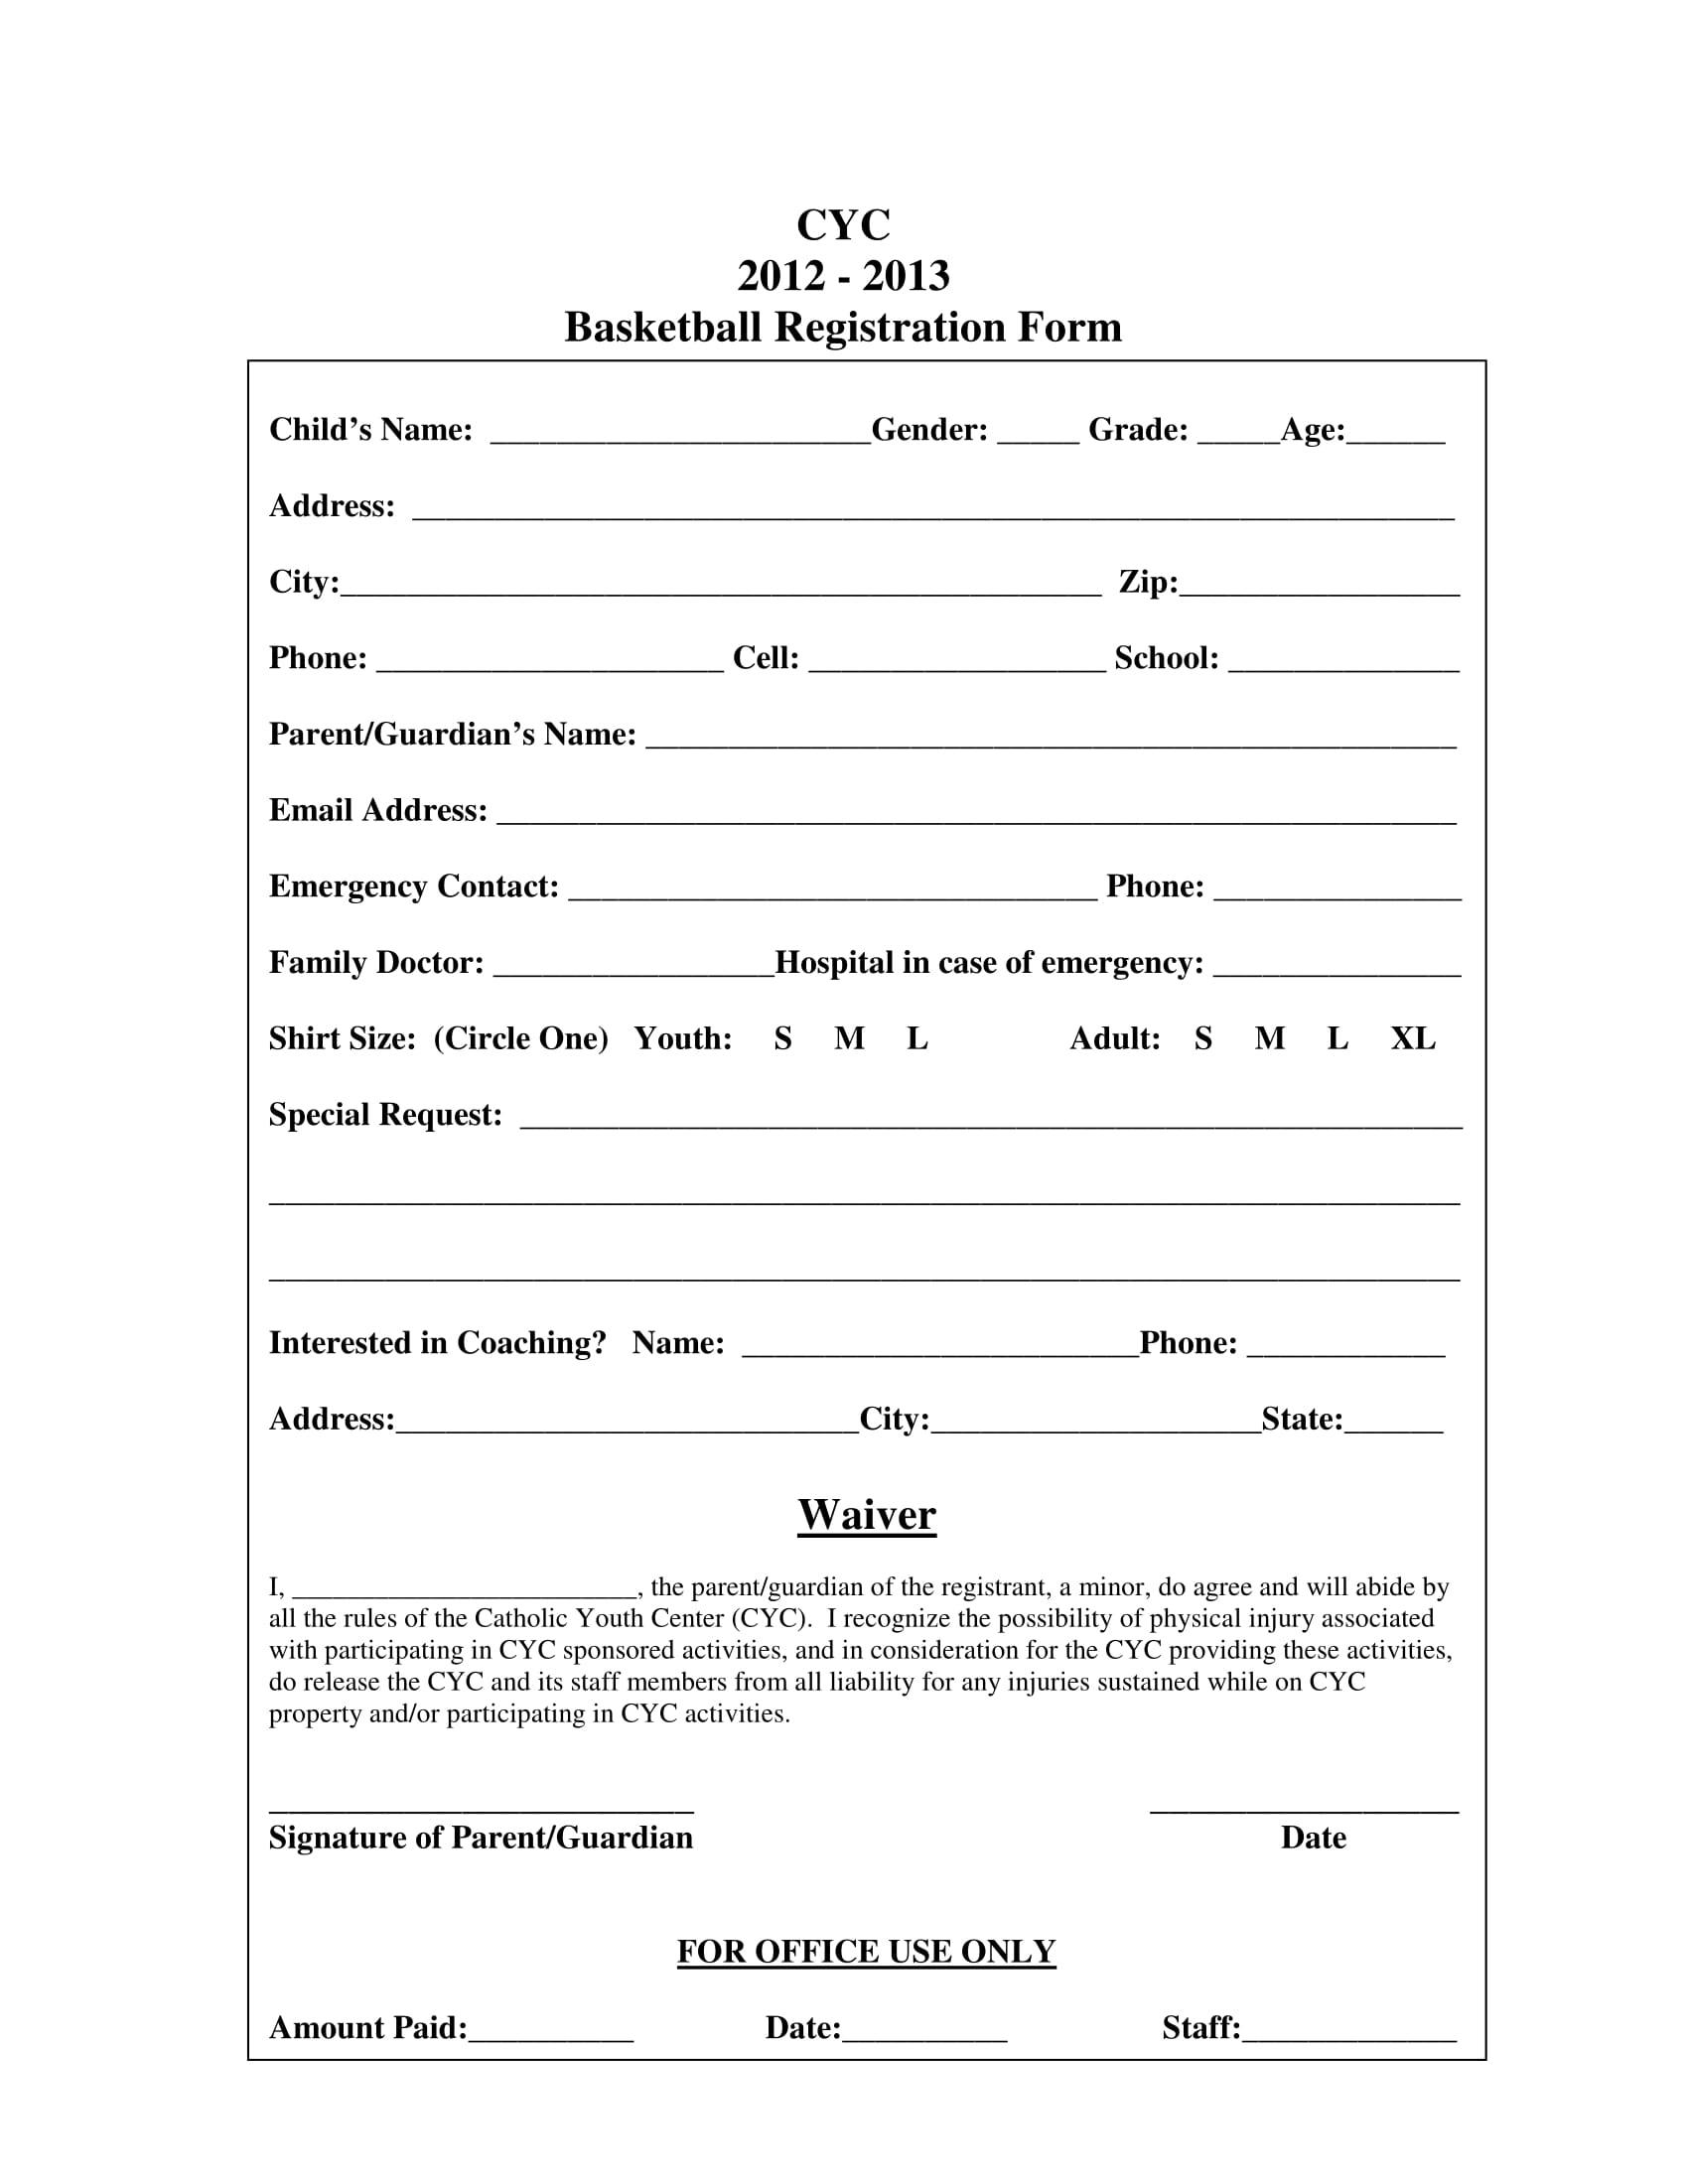 Basketball Registration Form Template Word